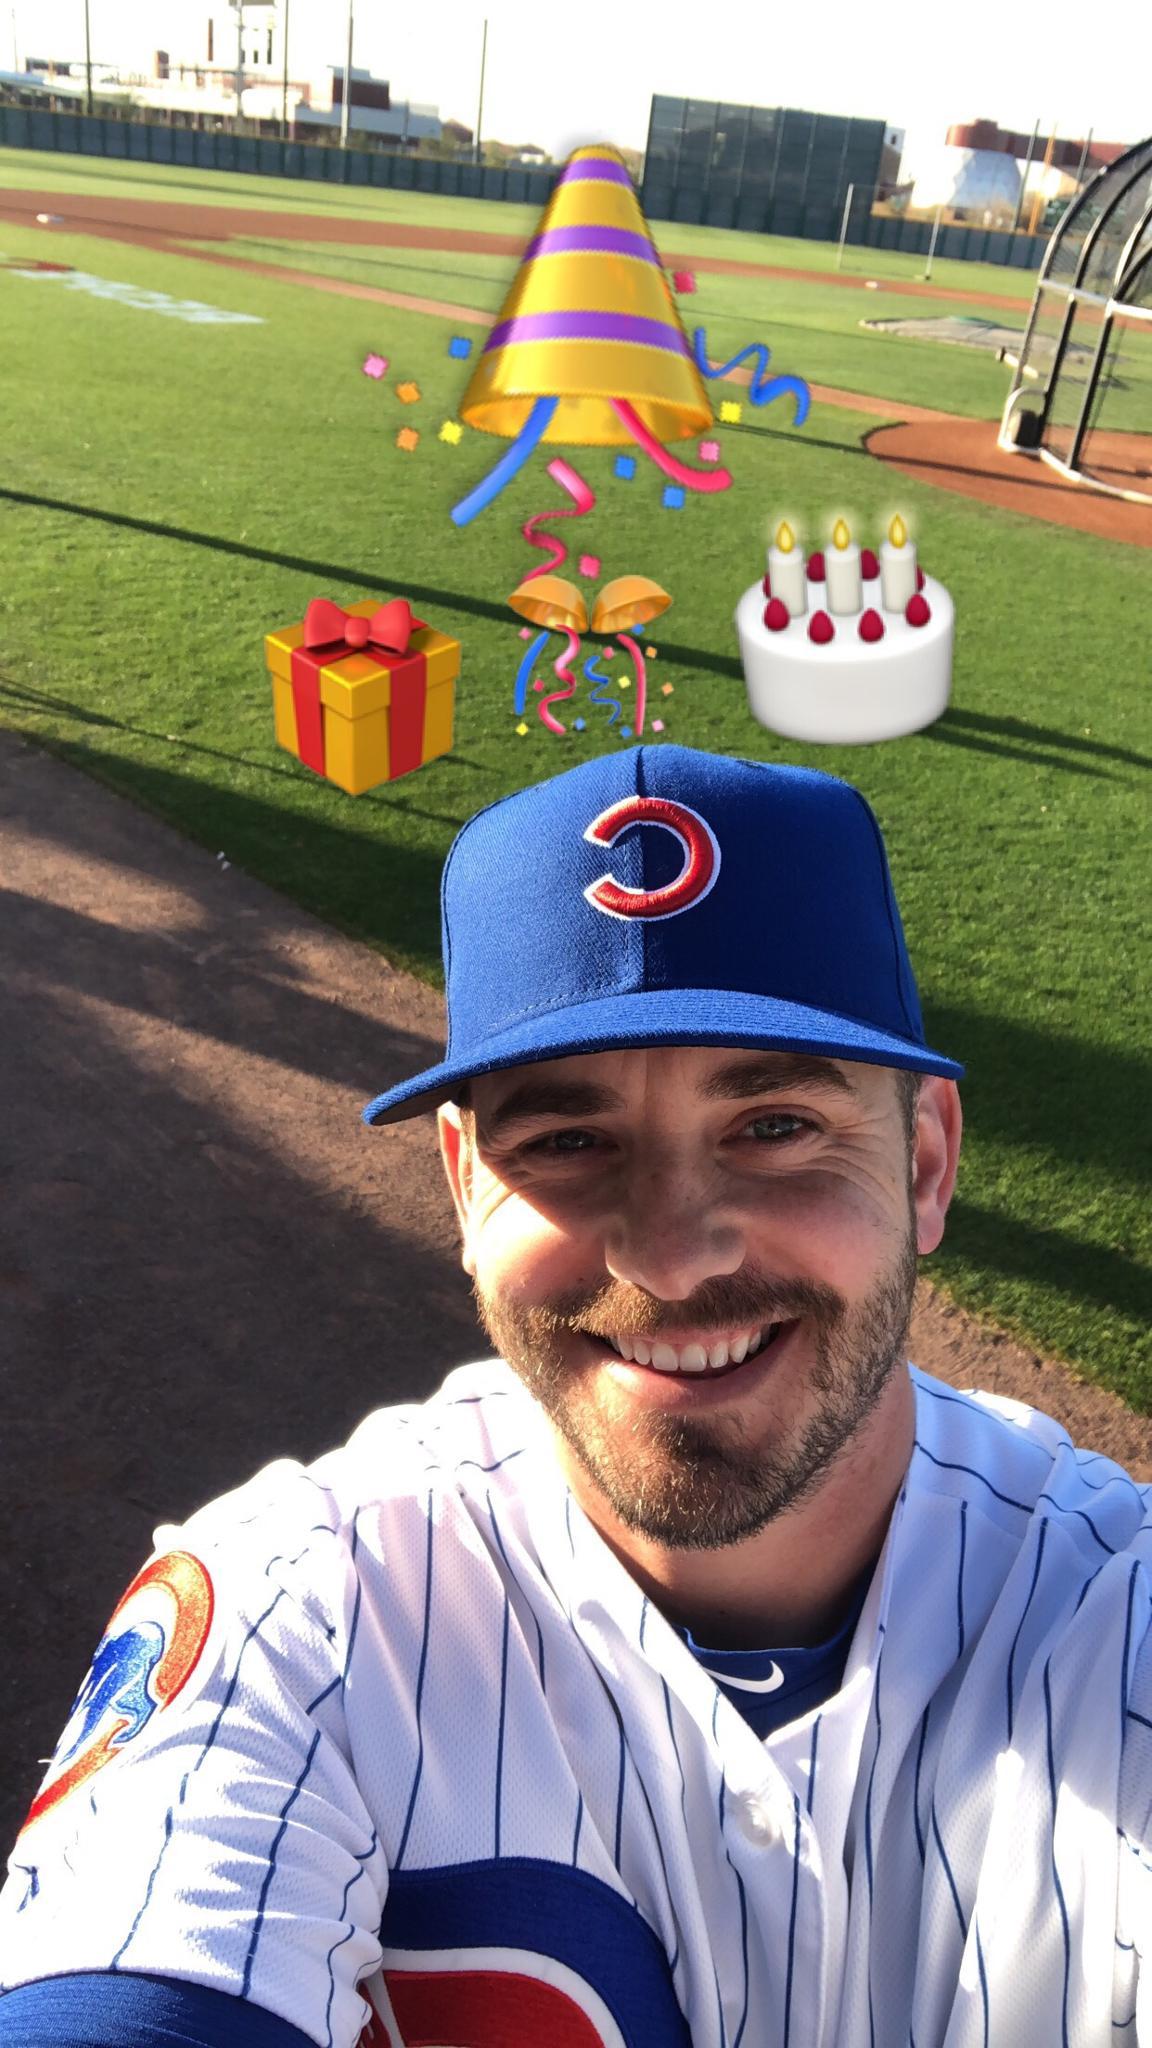 Wishing a happy birthday to @BrianDuensing52! https://t.co/Vto3qCcV79